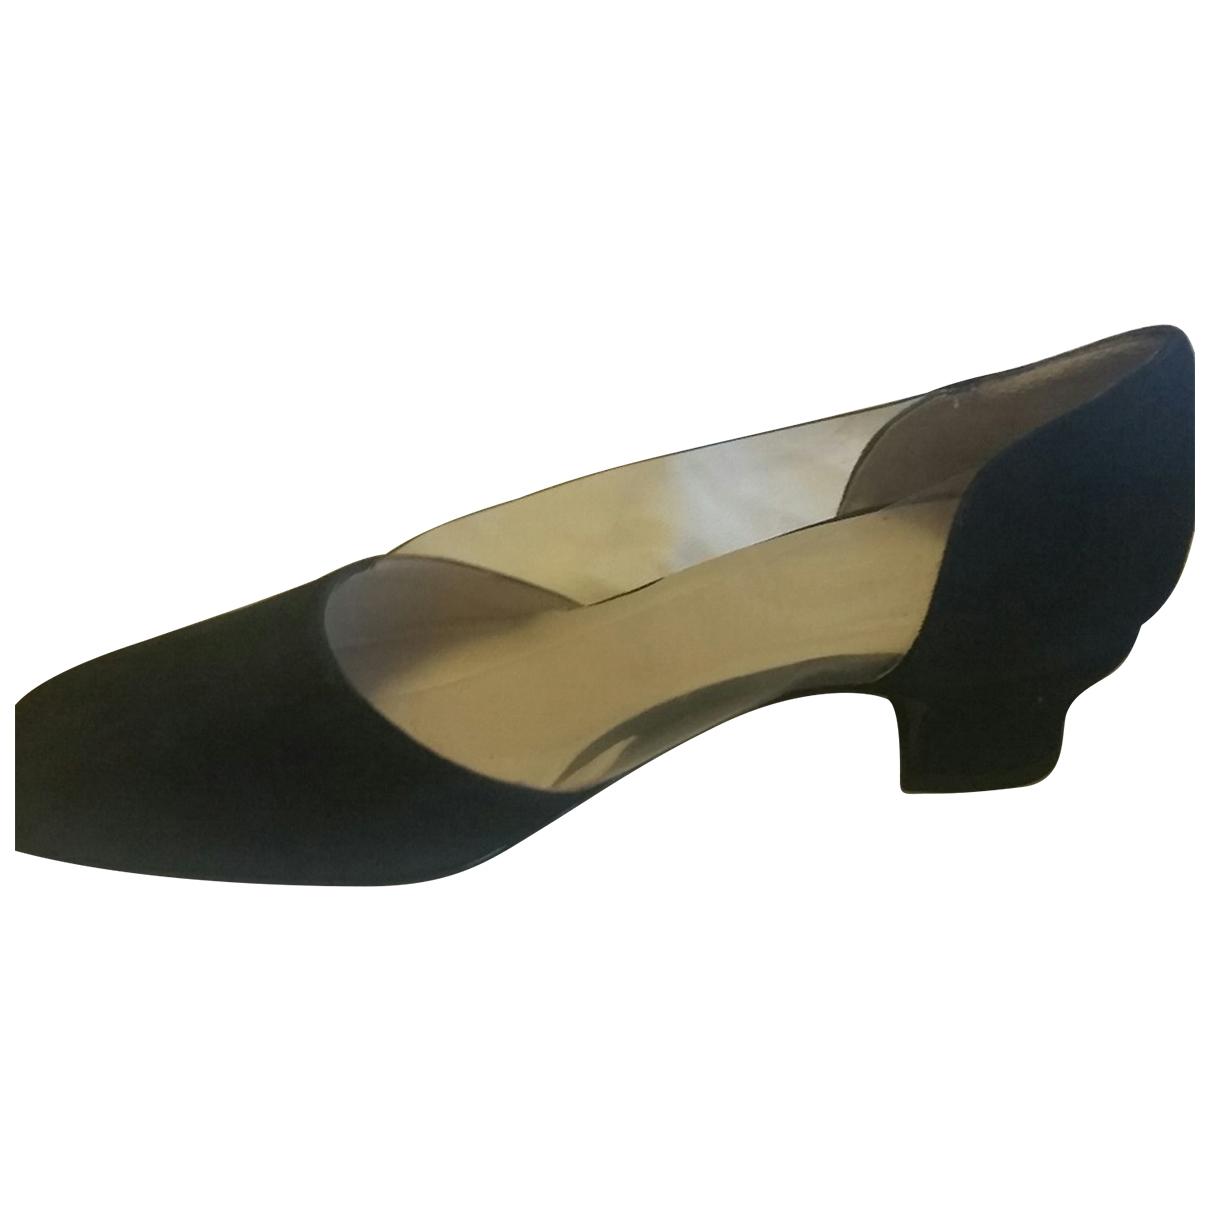 Giorgio Armani - Ballerines   pour femme en cuir - noir